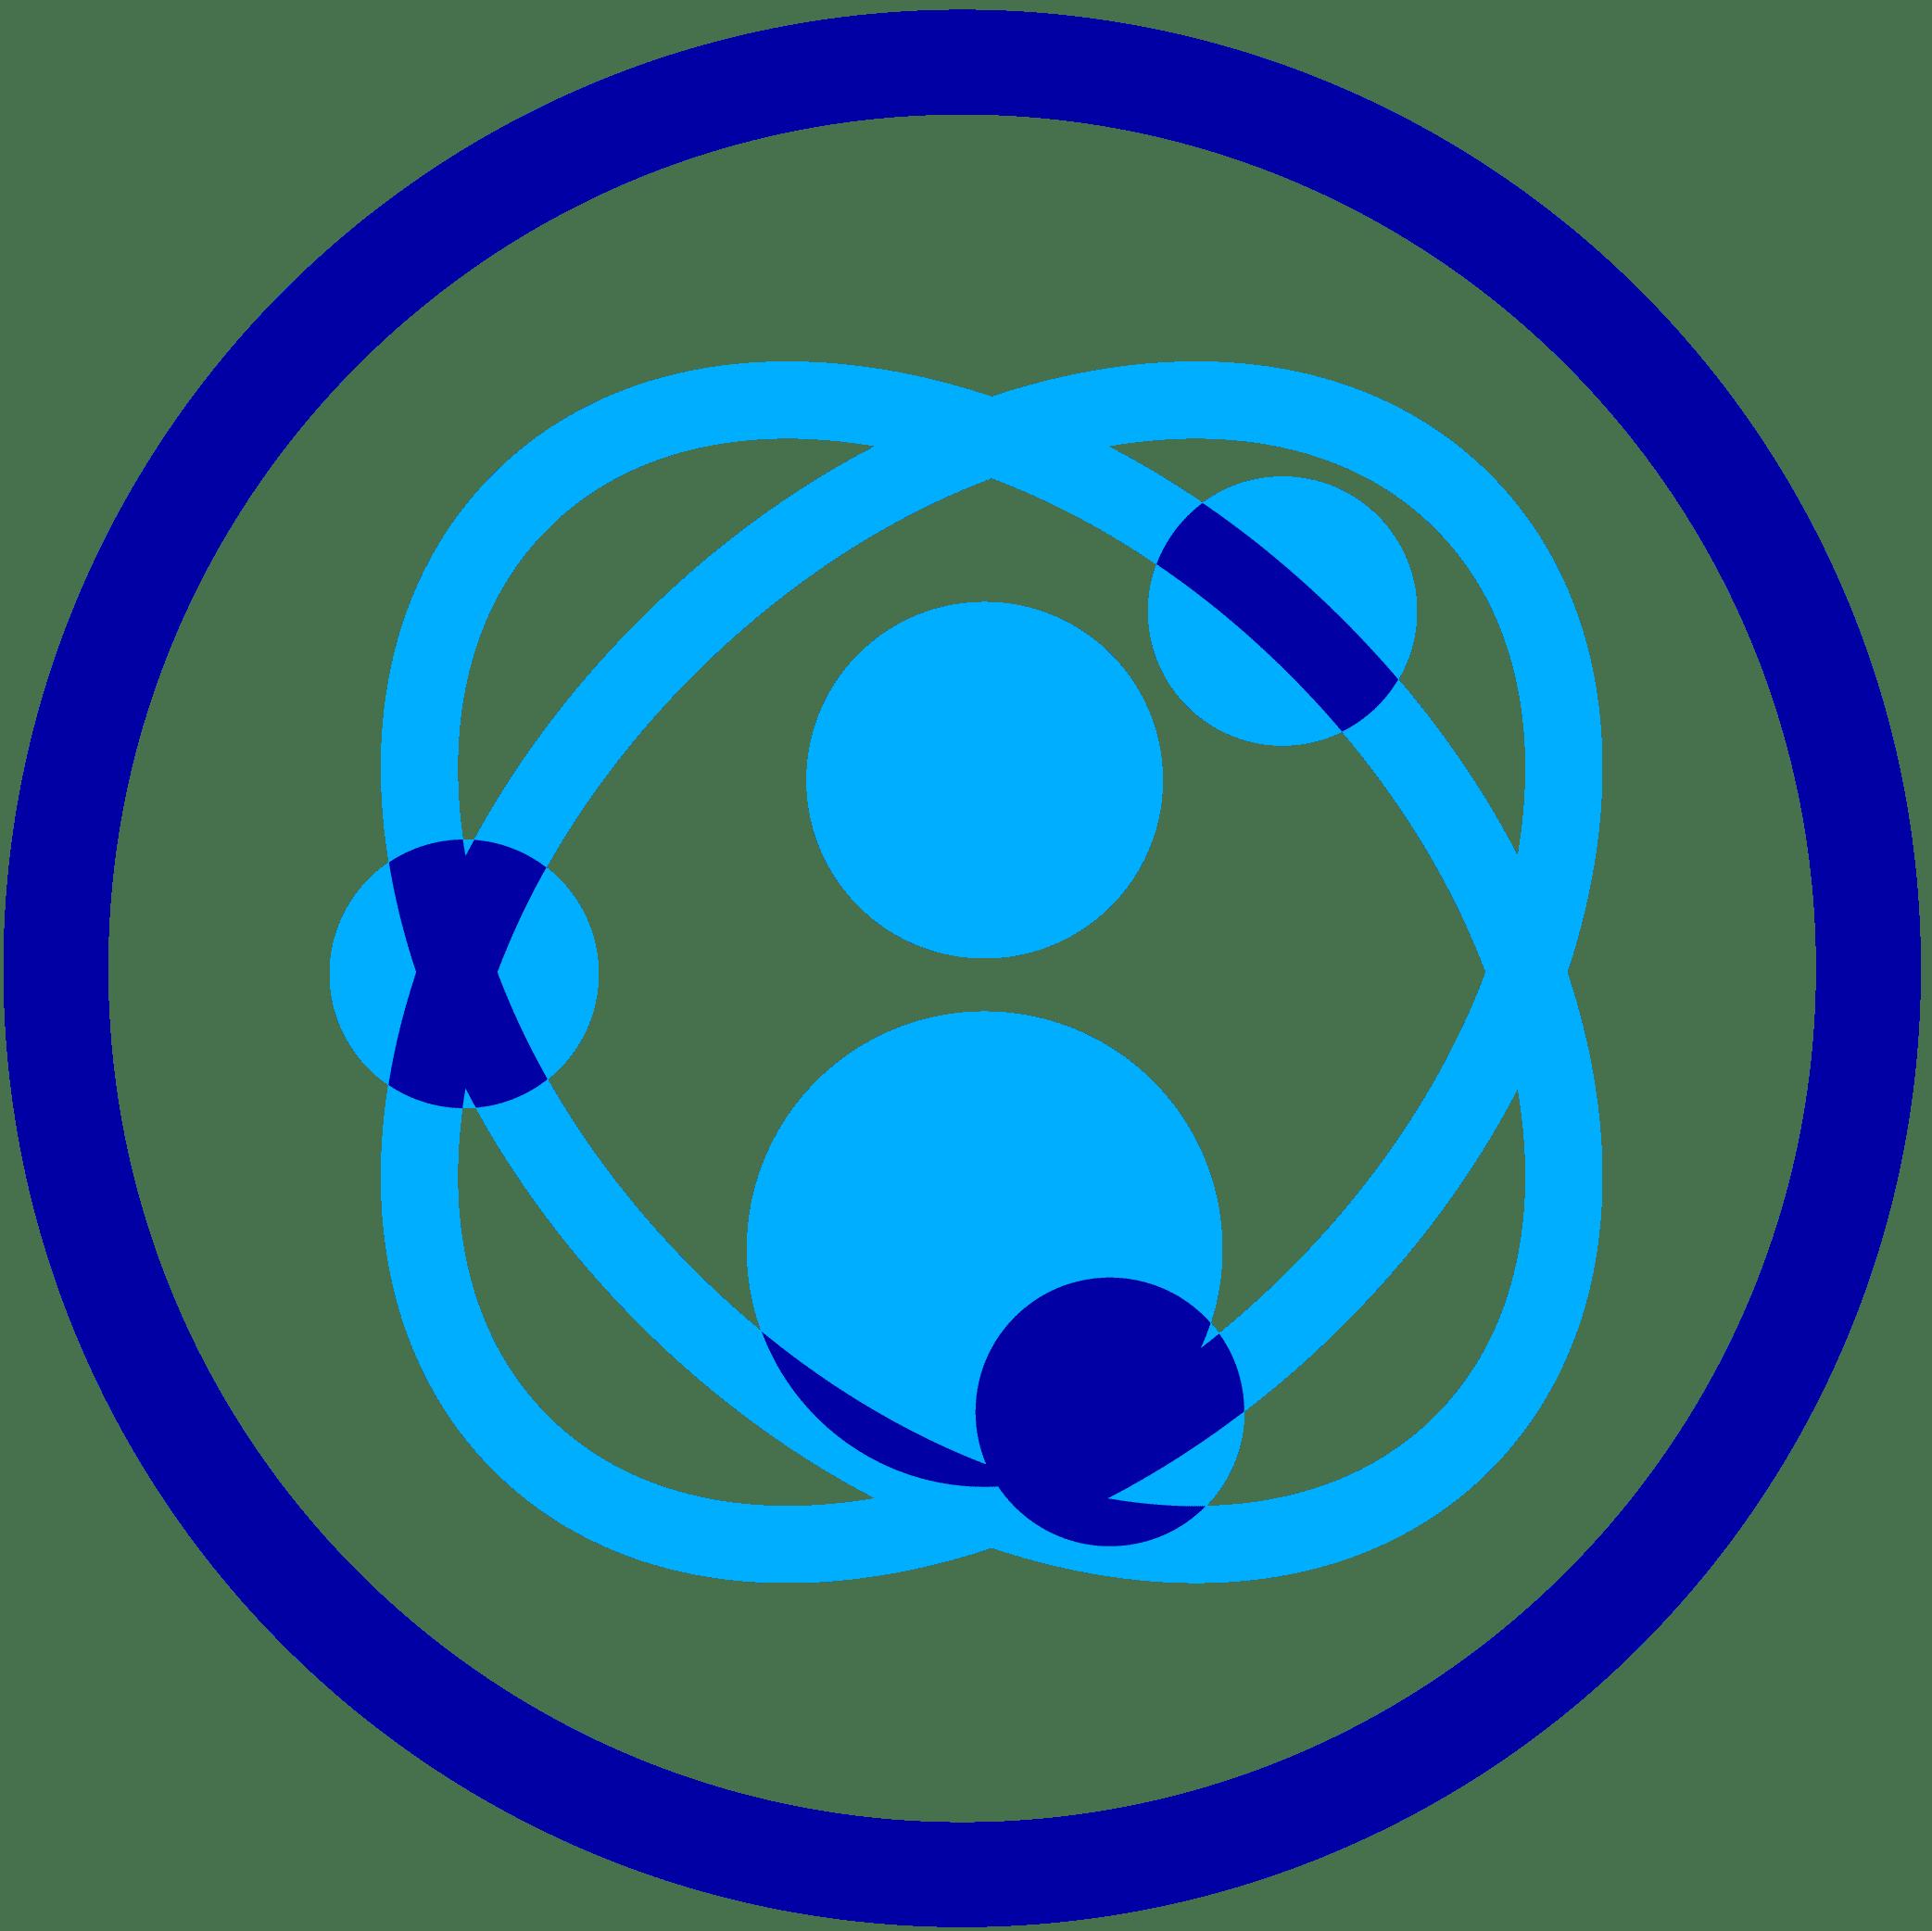 https://pt.fi-group.com/wp-content/uploads/sites/6/2021/02/blue-icons-set_1-55.png